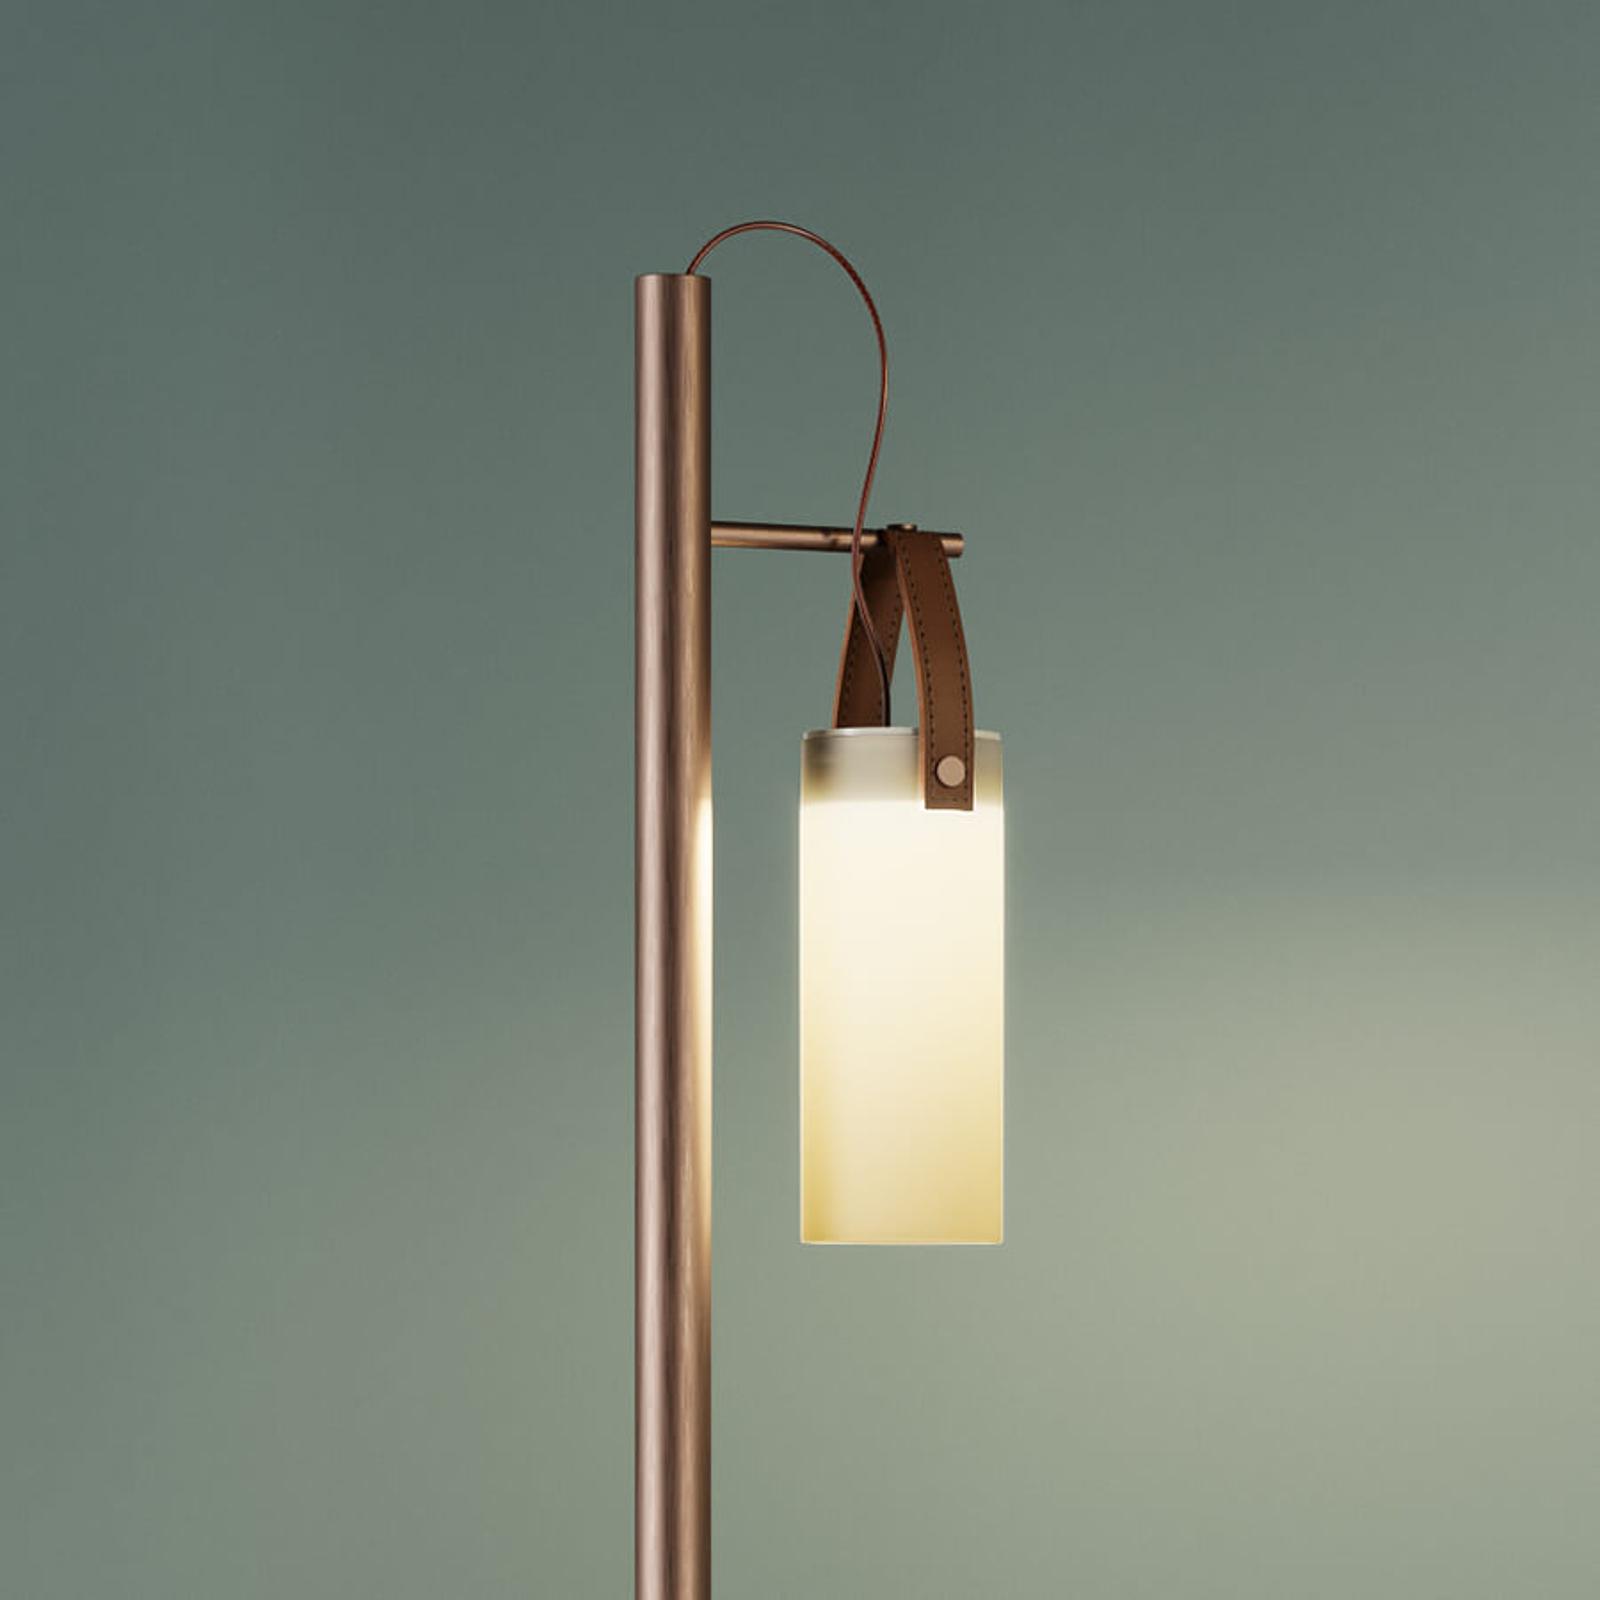 Lámpara de pie LED Galerie, un punto de luz